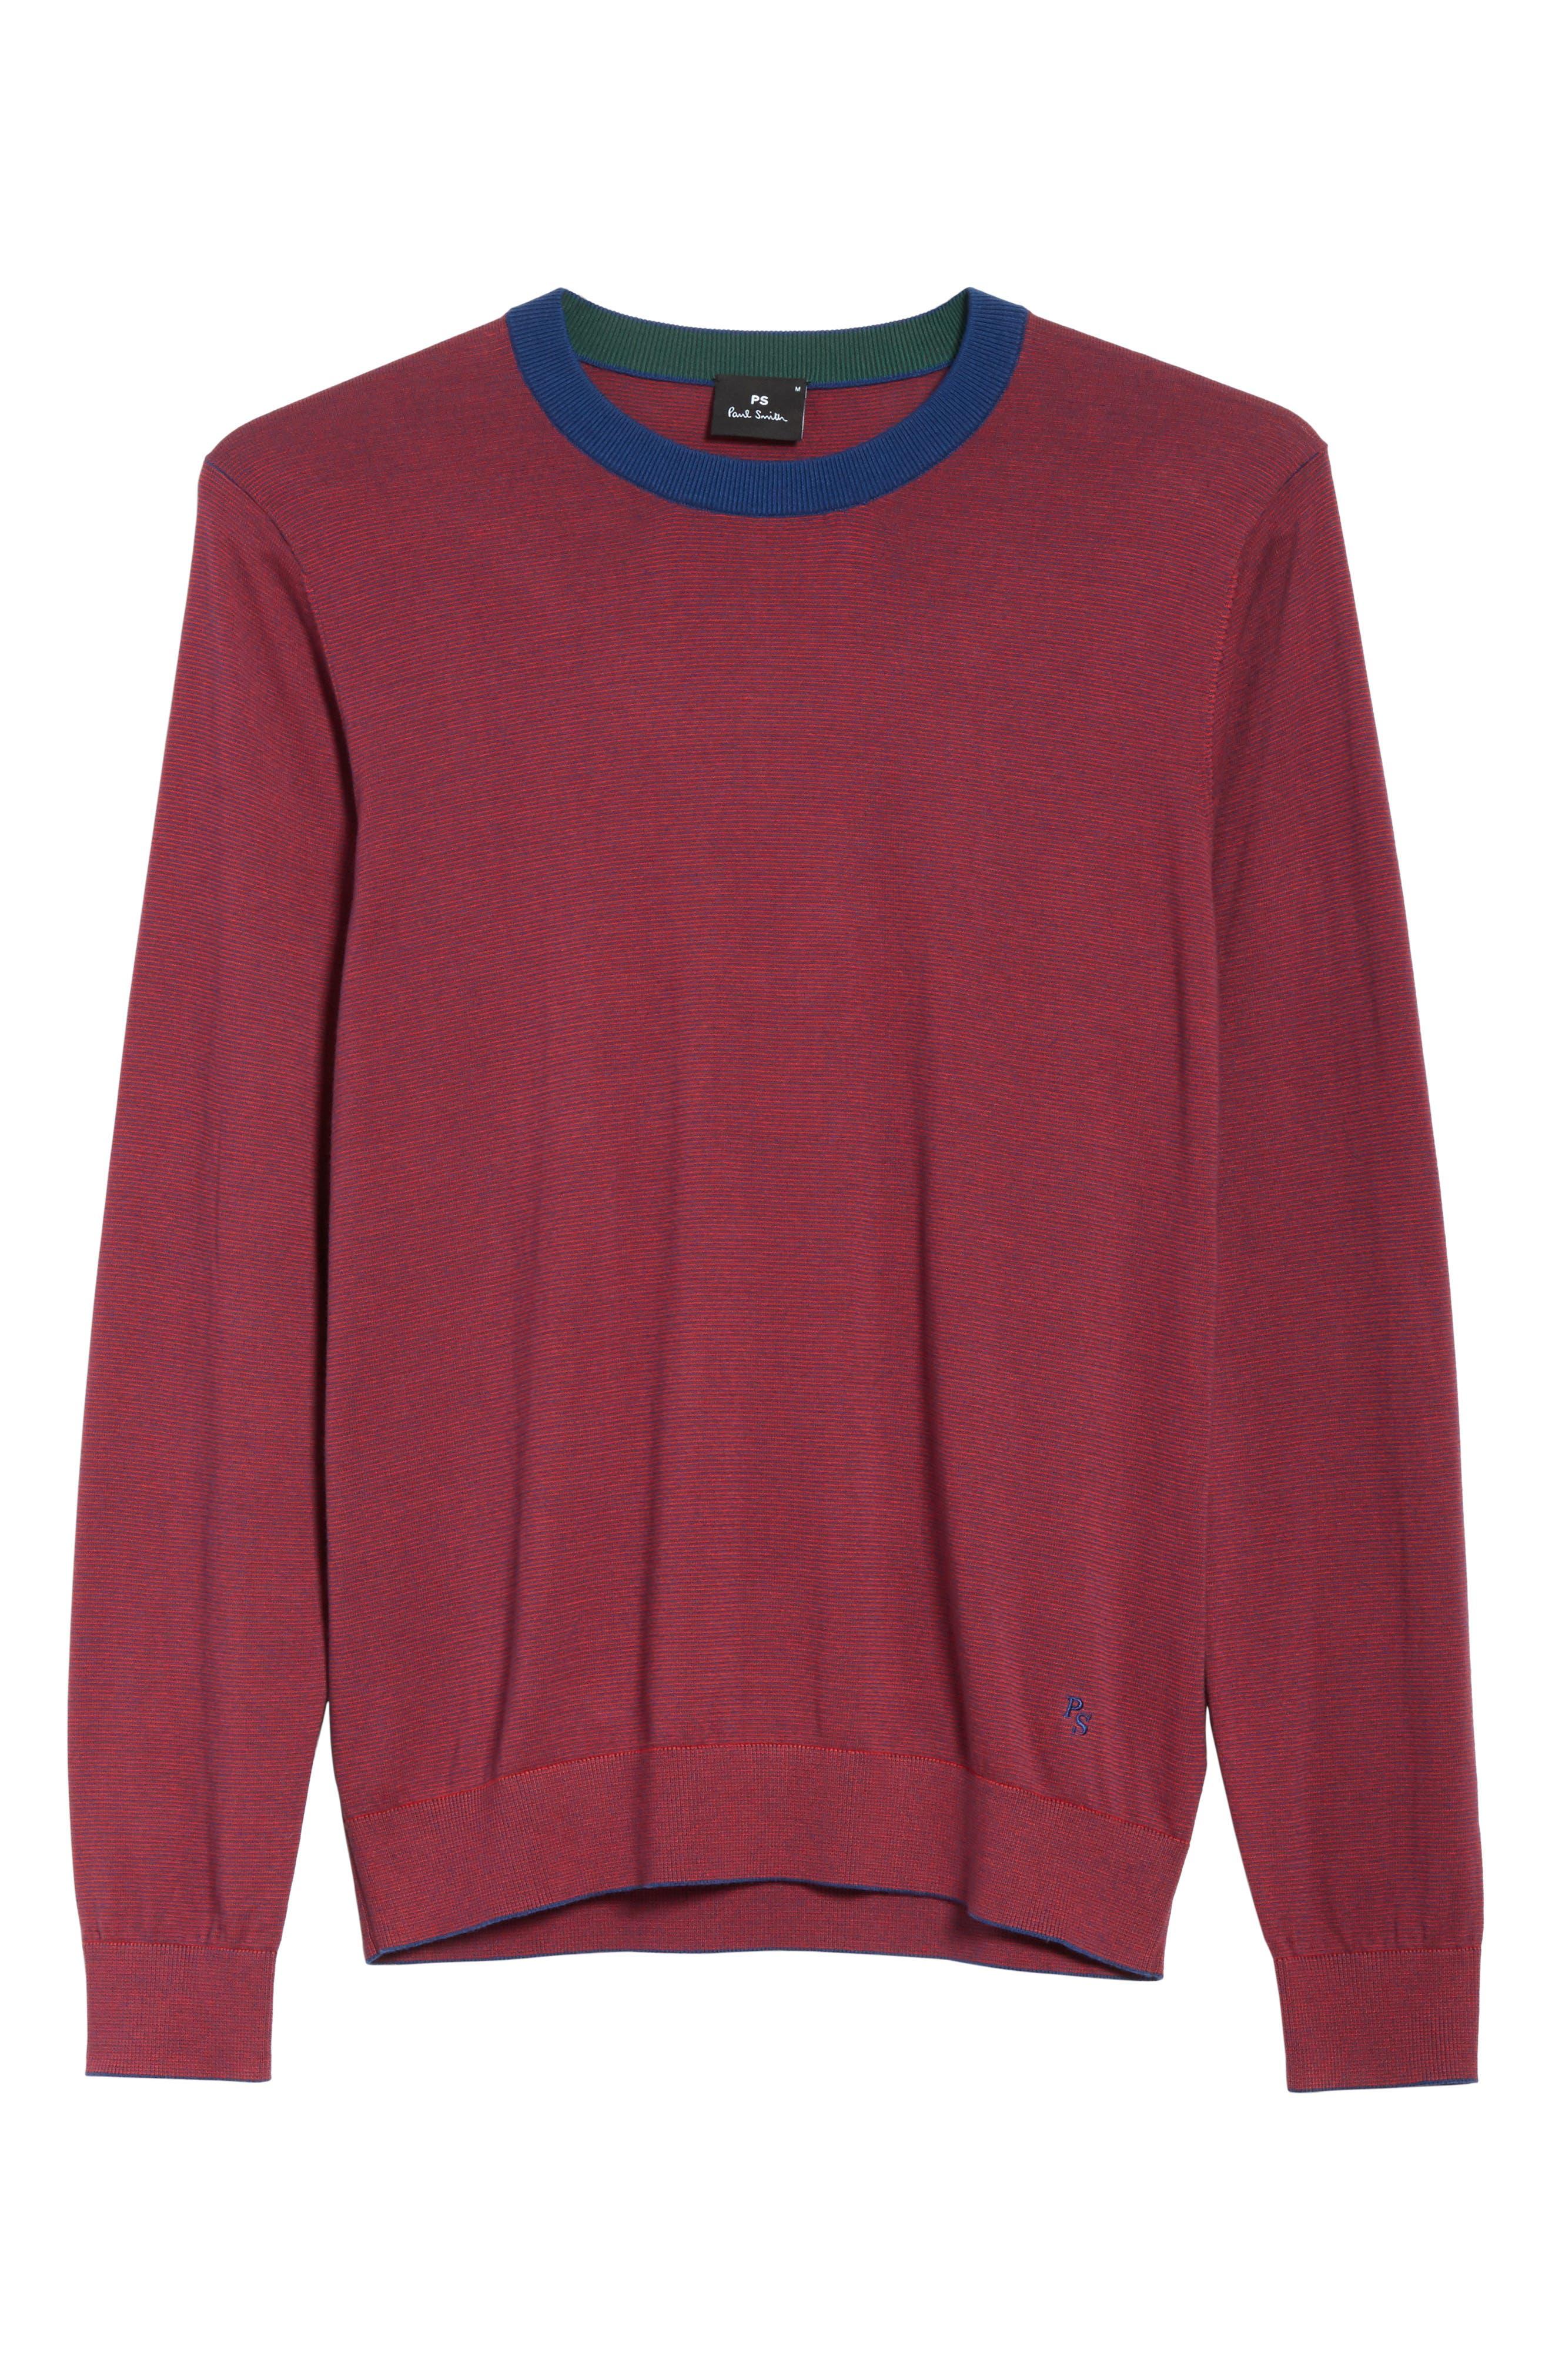 Ministripe Crewneck Sweater,                             Alternate thumbnail 6, color,                             415